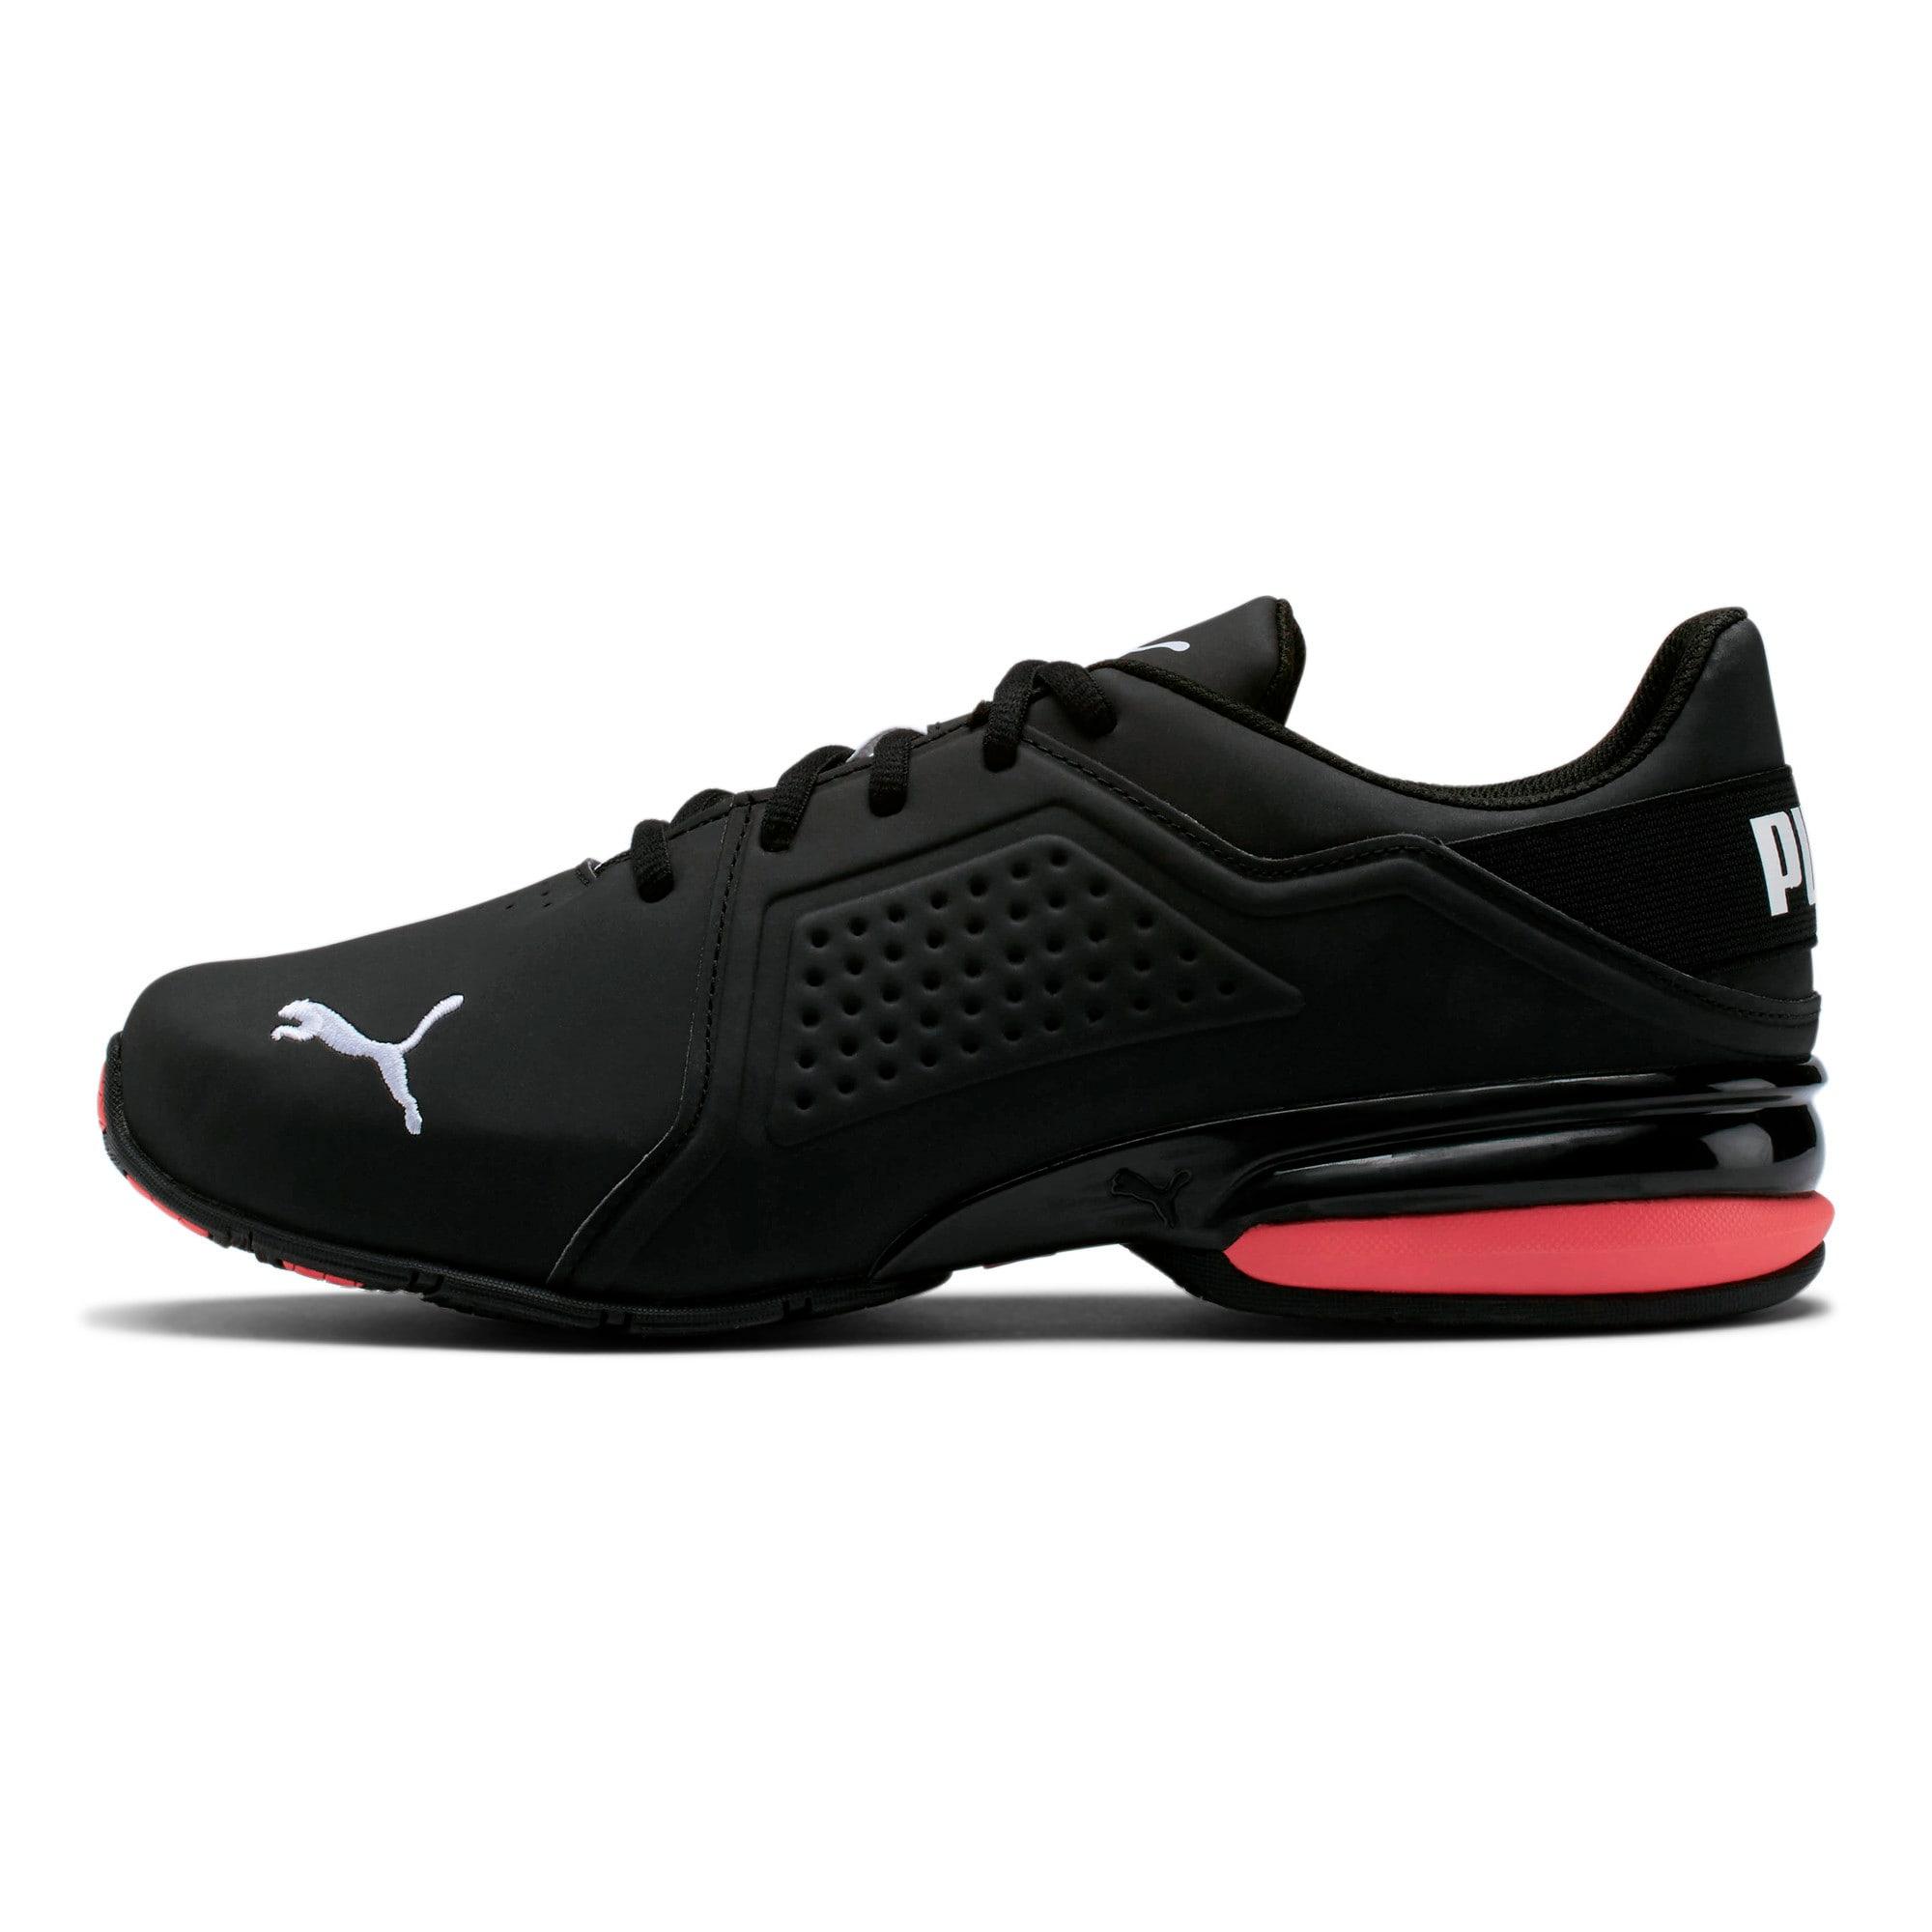 Thumbnail 1 of Viz Runner Men's Running Shoes, Puma Black-Puma White, medium